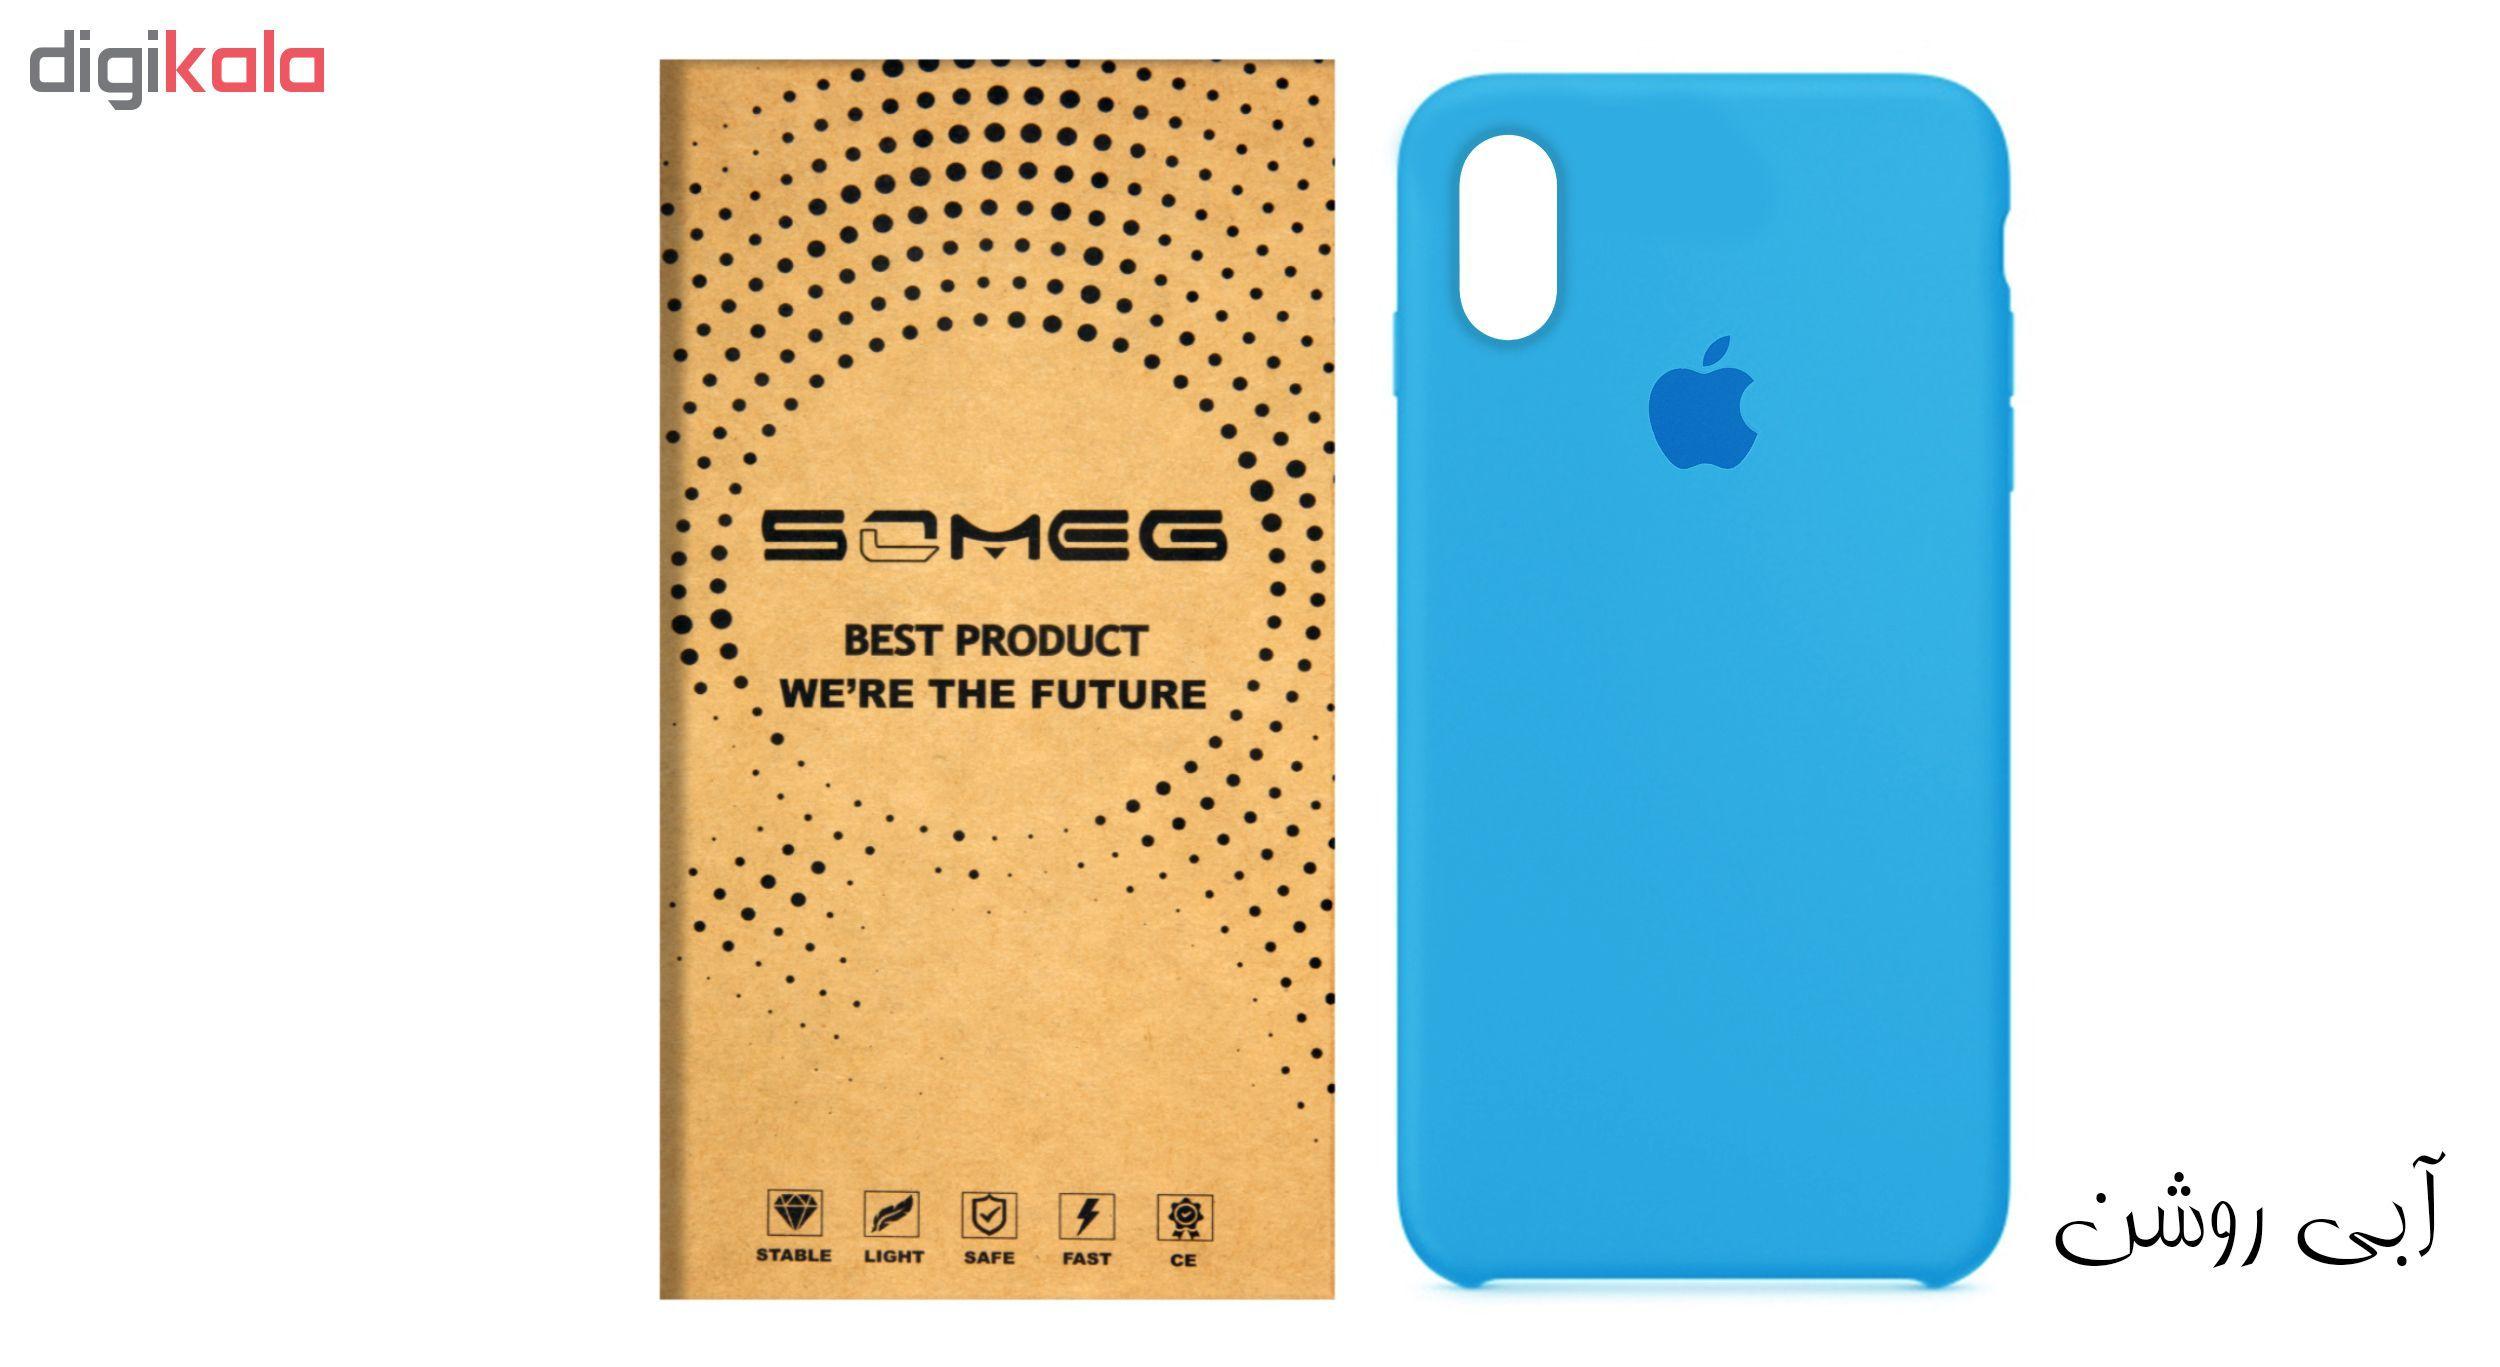 کاور سومگ مدل SIC مناسب برای گوشی موبایل اپل iPhone X  main 1 11